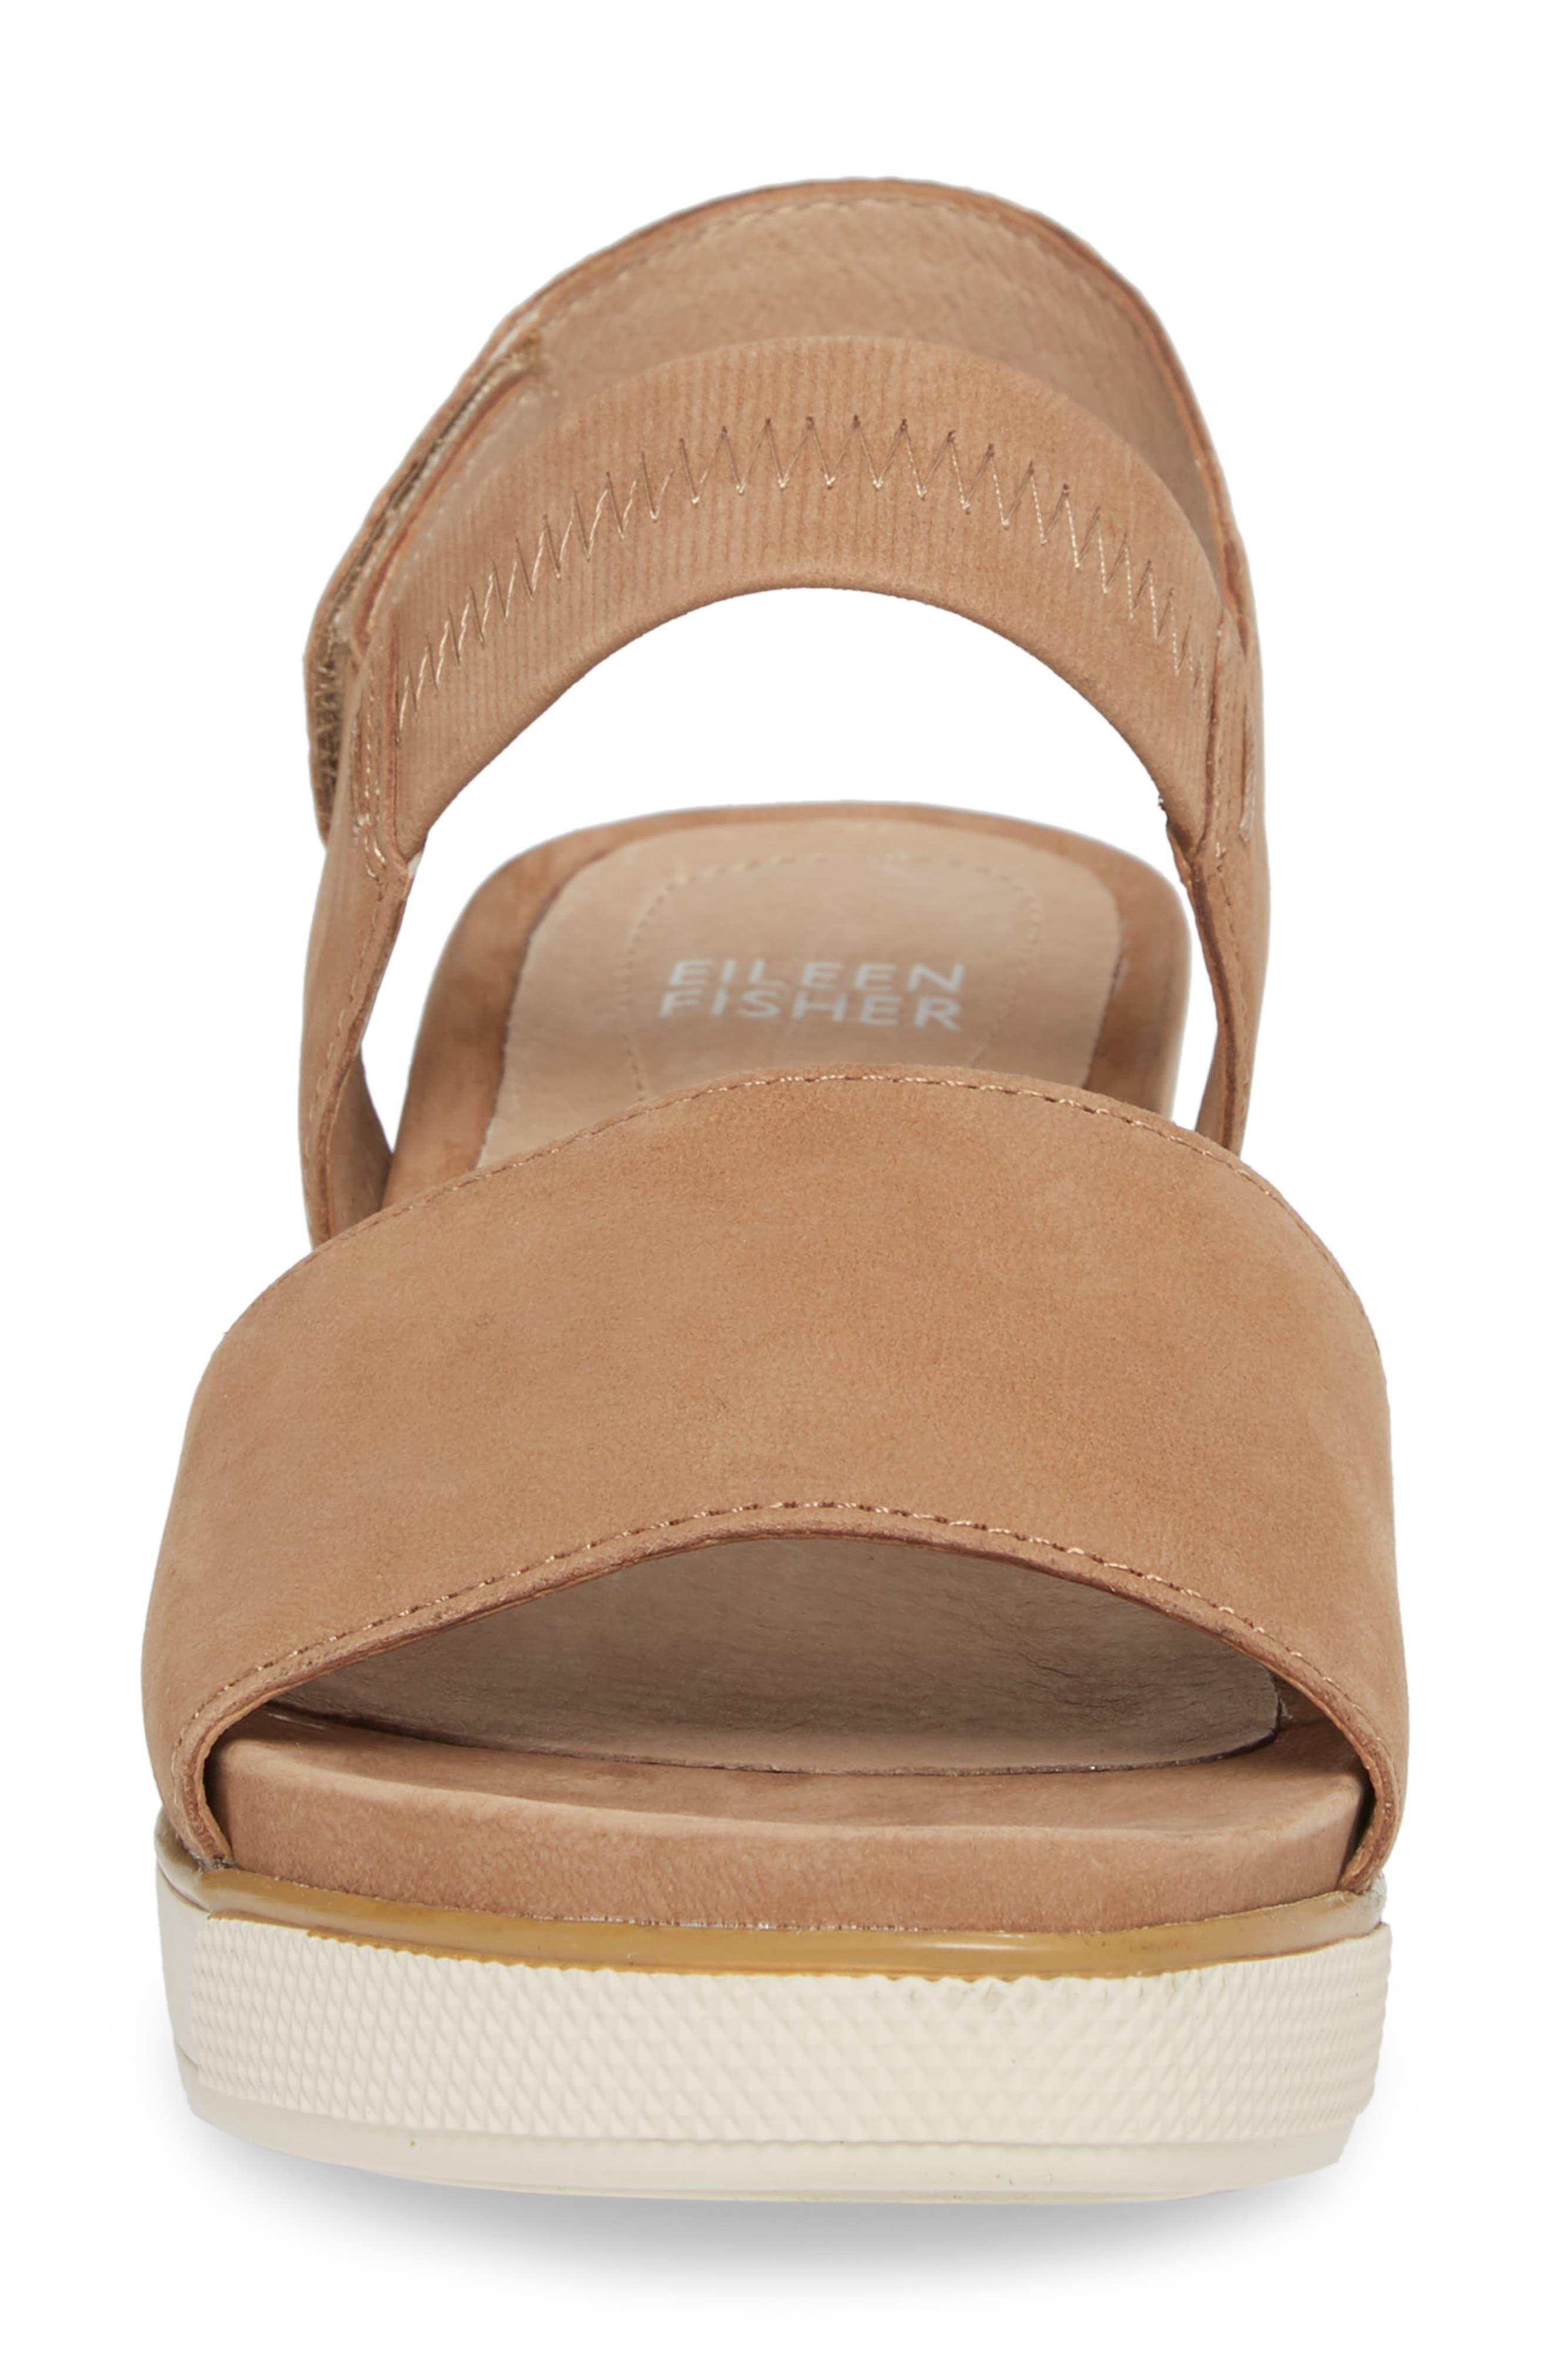 Somer Sandal,                             Alternate thumbnail 4, color,                             Wheat Nubuck